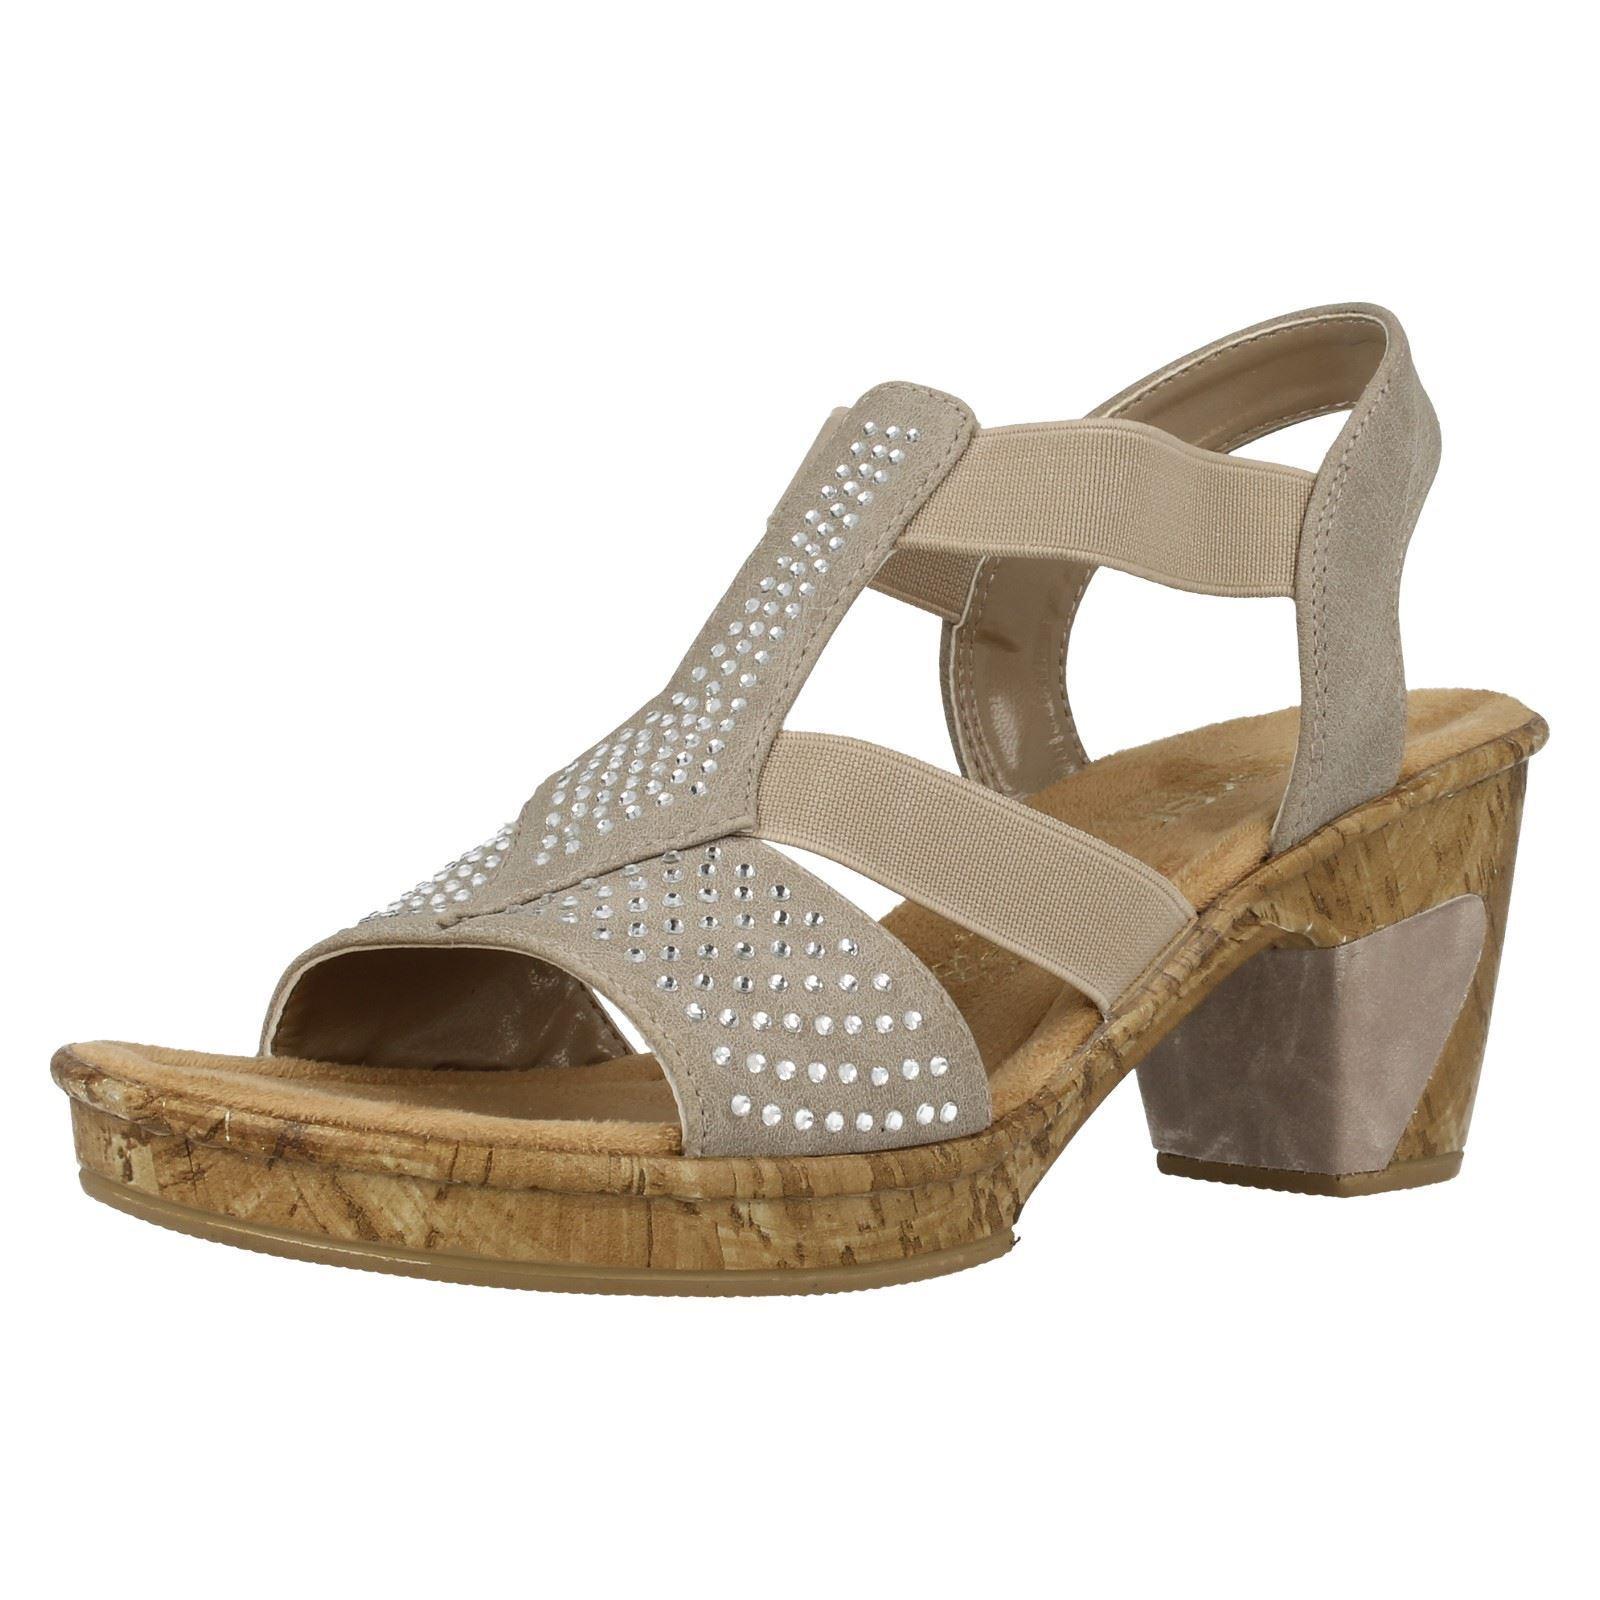 Ladies Rieker 69732 Beige Heeled Sandals With Diamante Detail